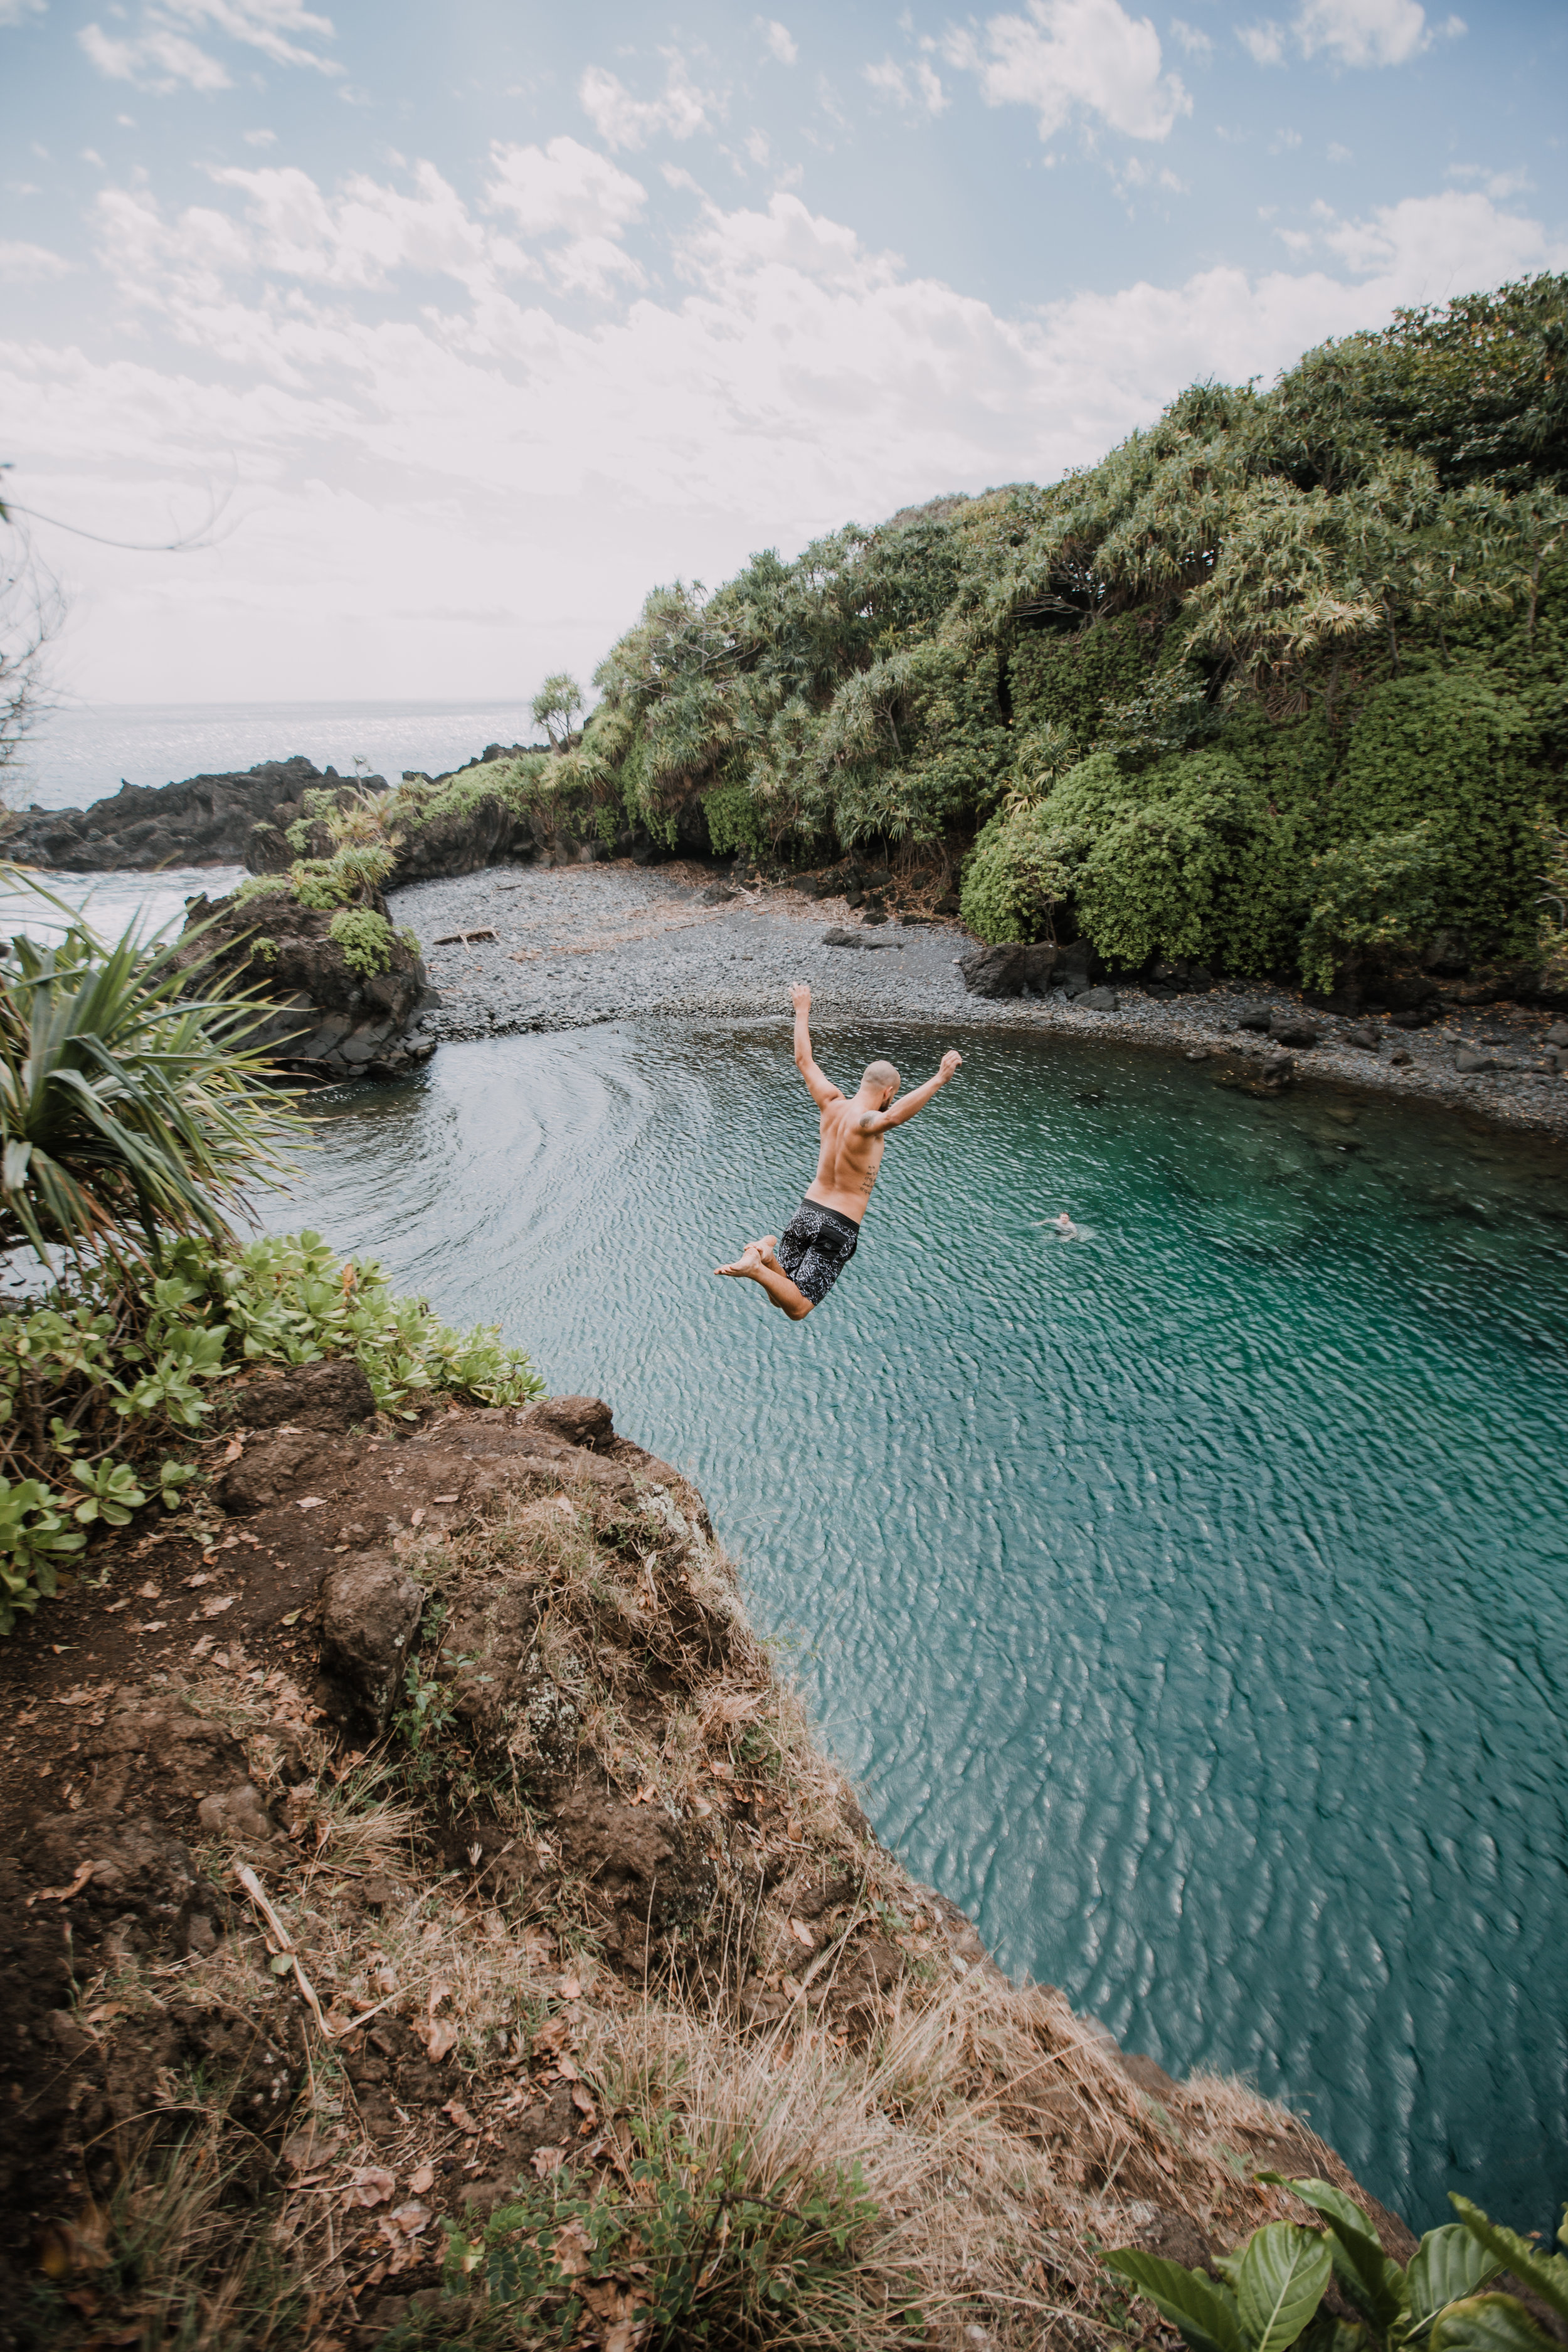 hawaii cliff jumping, seven sacred pools at ohe'o, island hiking, road to hana, hawaii wedding photographer, hawaii elopement photographer, maui wedding, maui engagements, maui elopement